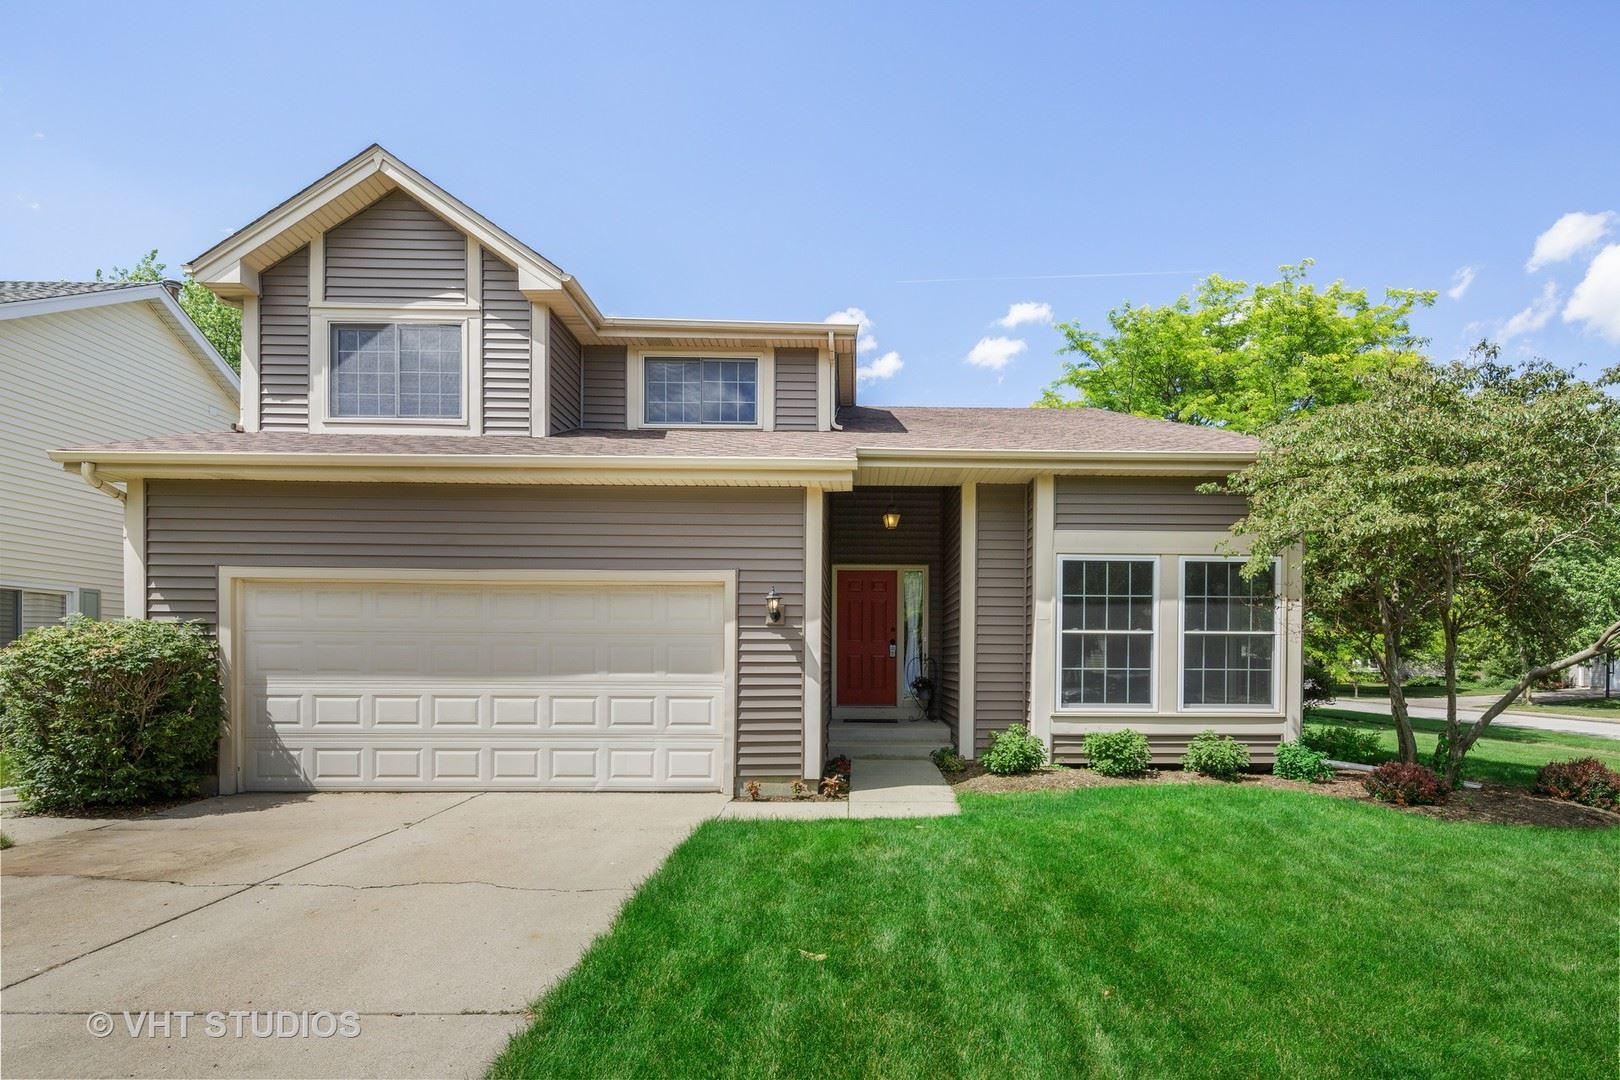 1234 Amberwood Drive, Crystal Lake, IL 60014 - #: 10761045